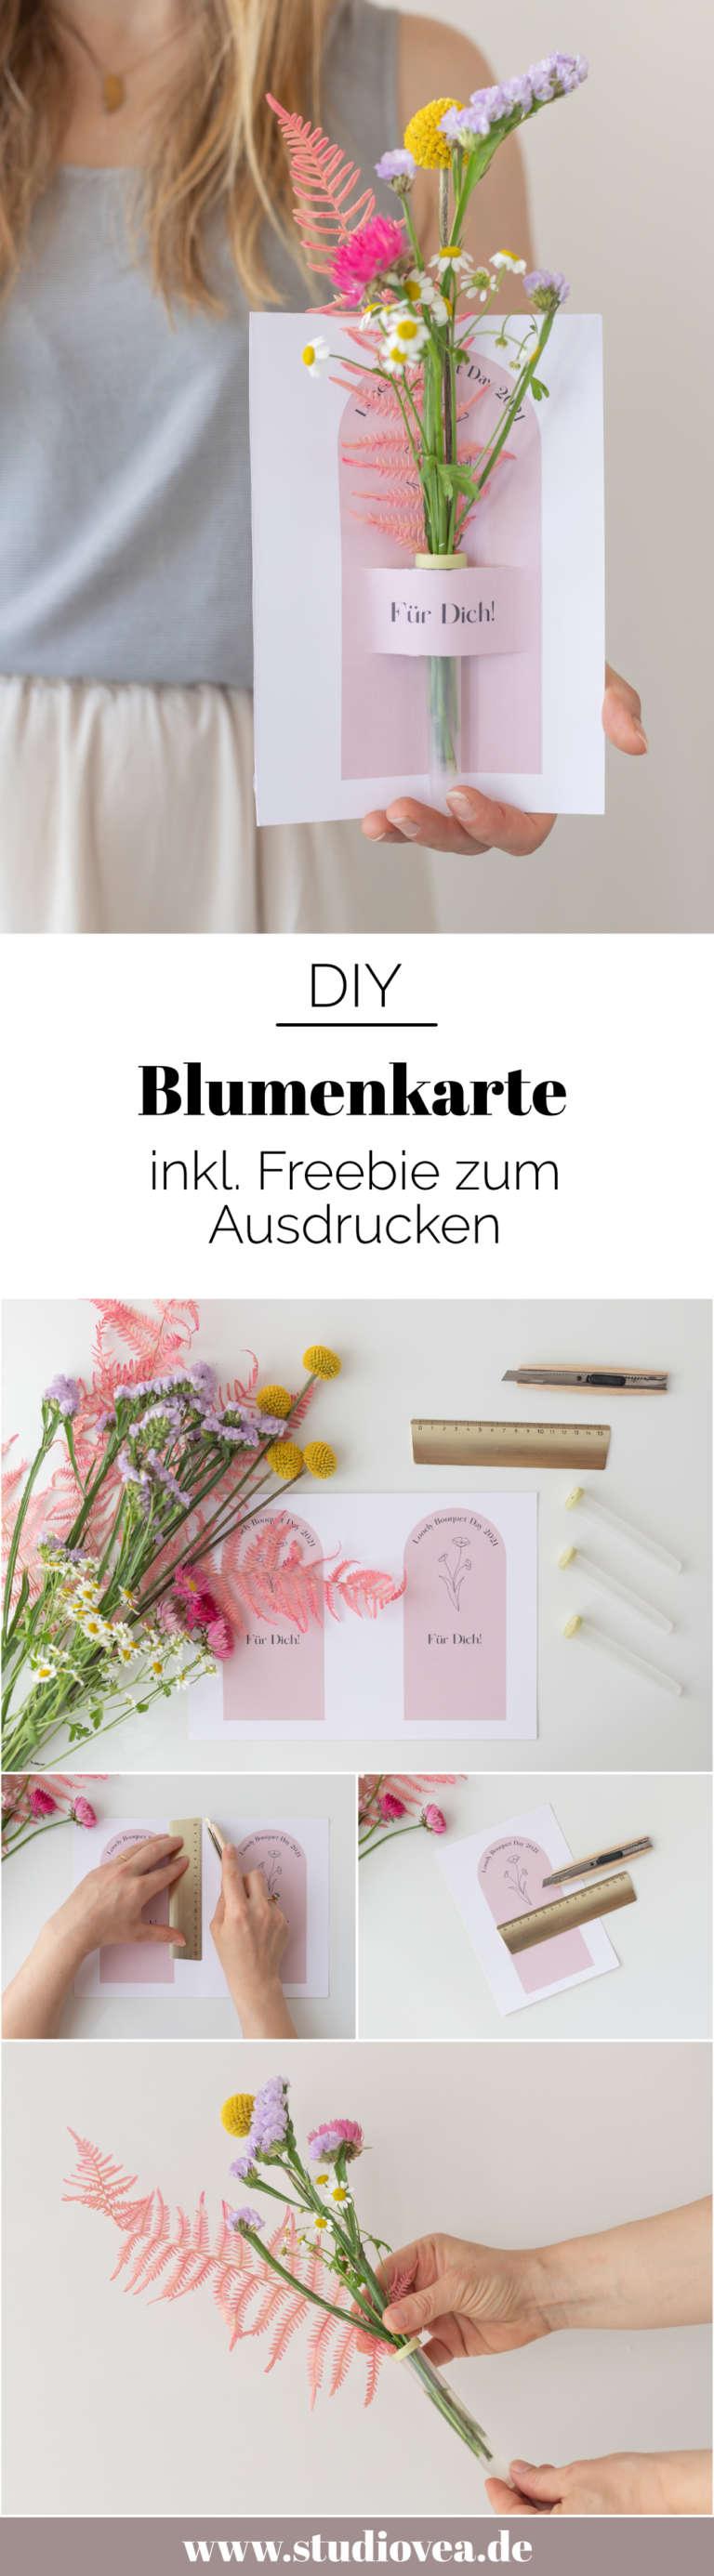 Anleitung DIY Blumenkarte studiovea